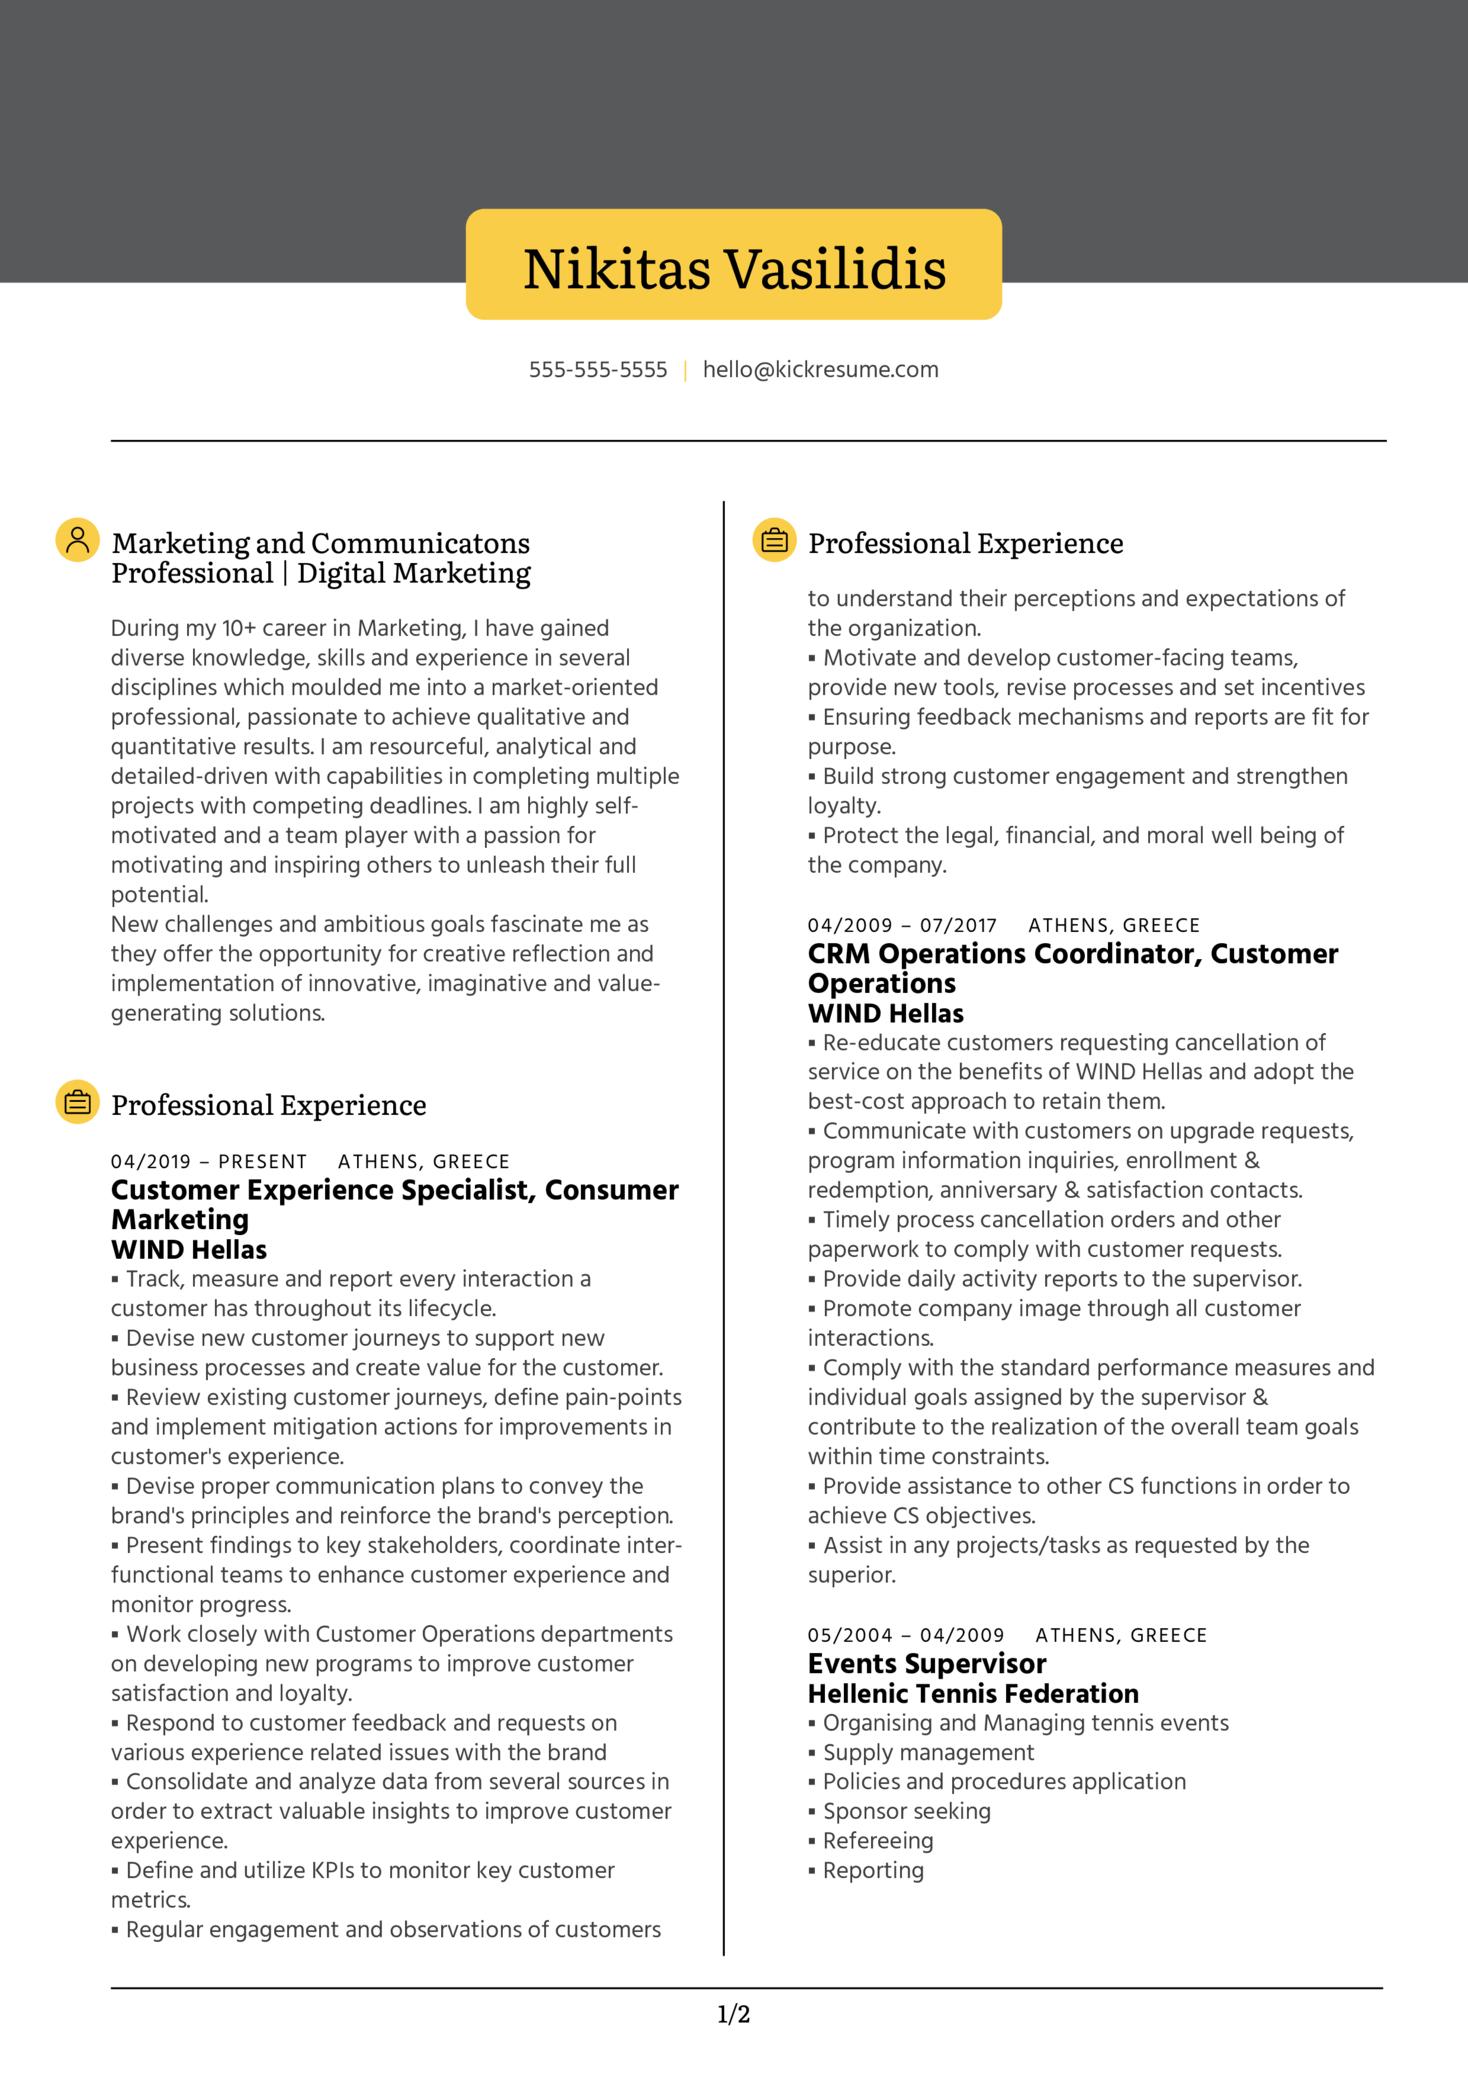 Digital Marketer Resume Example (Part 1)